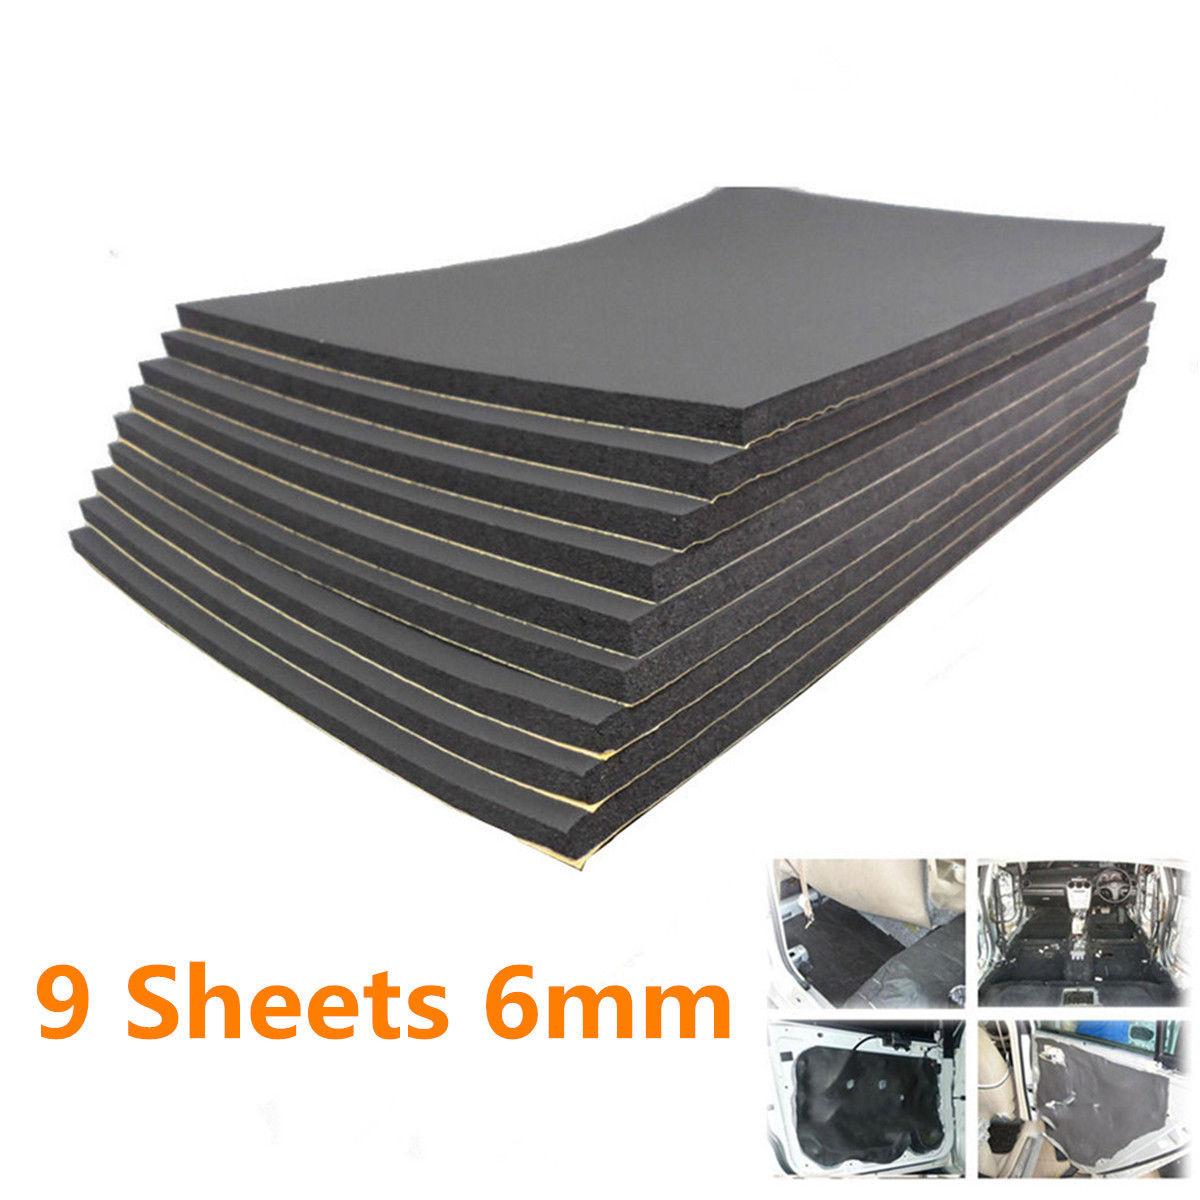 9Pcs Car Van Sound Proofing Deadening Insulation Foam 30x50cm 6mm Auto Noise Insulation Deadening Mat Hood Closed Cell Foam